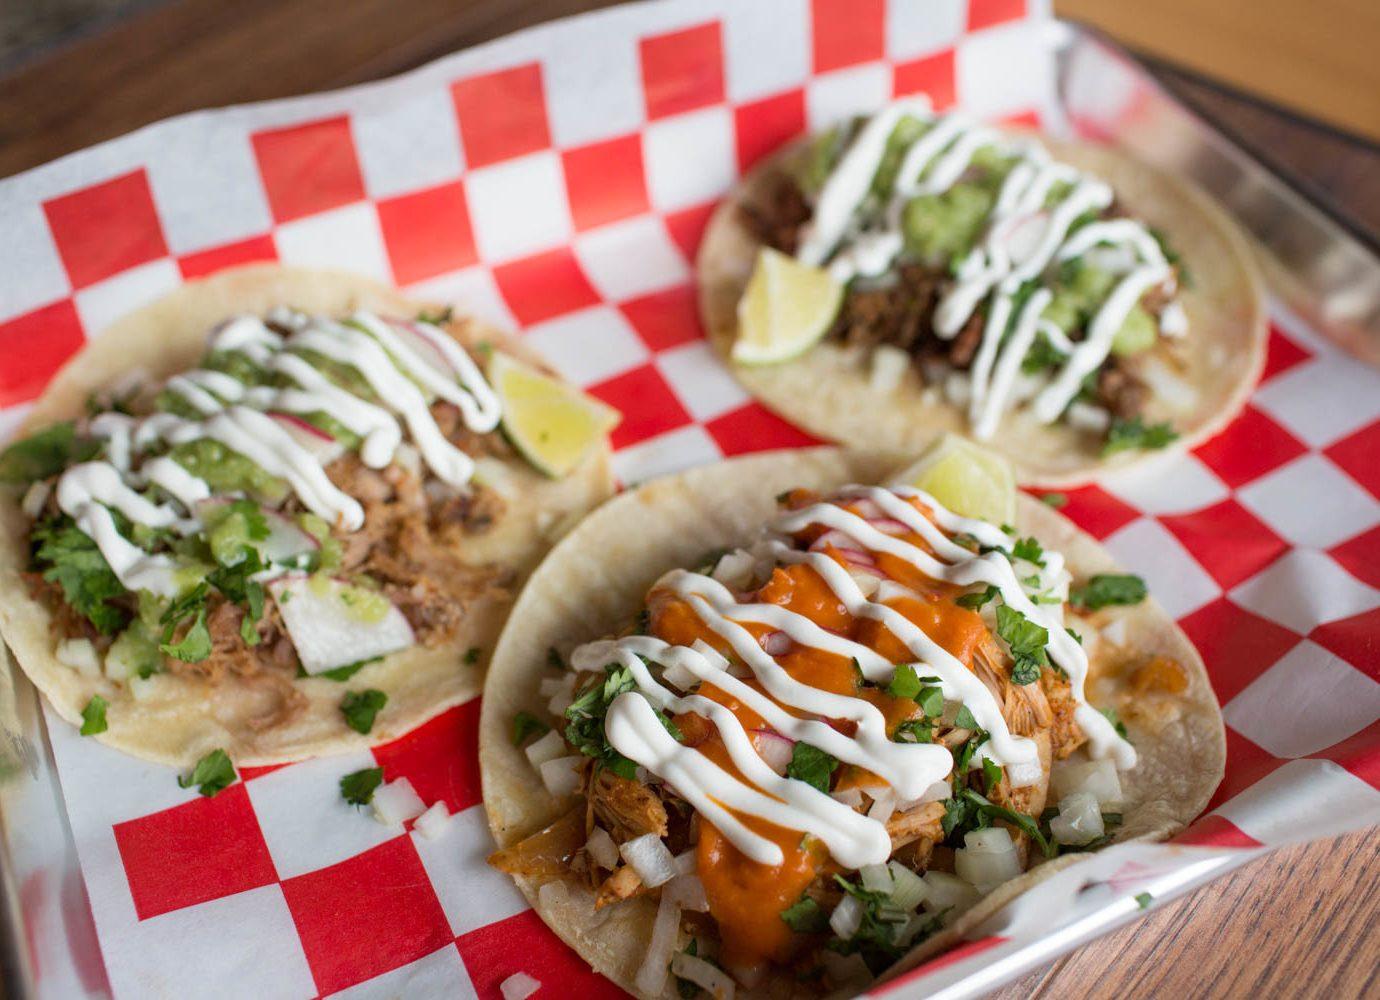 Food + Drink food table dish indoor plate cuisine meal produce vegetarian food street food toppings